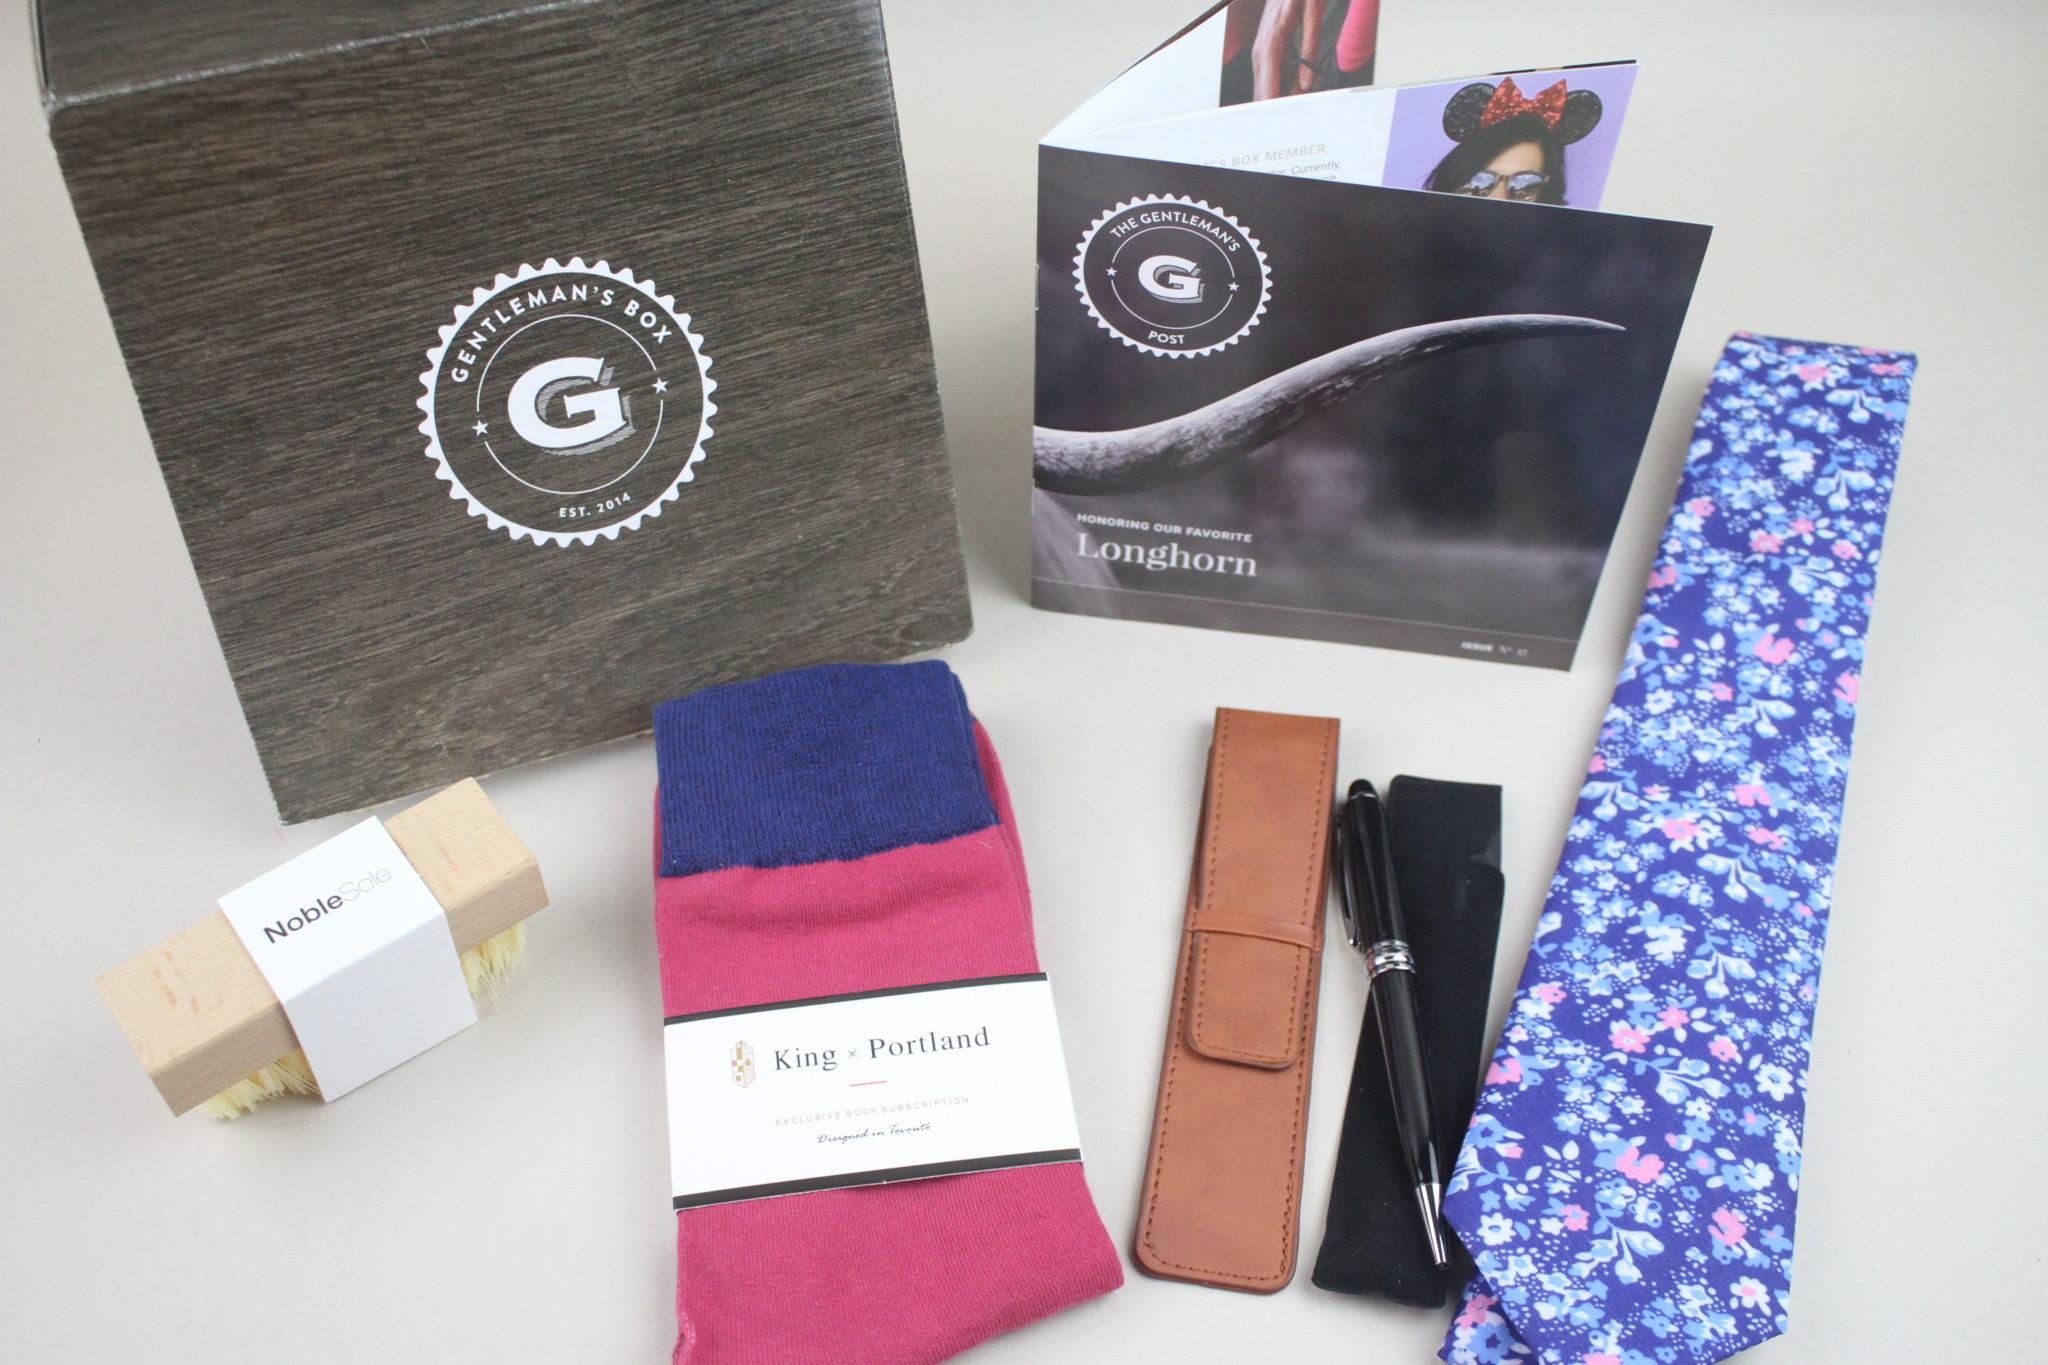 Gentleman's Box May 2020 Subscription Box Review